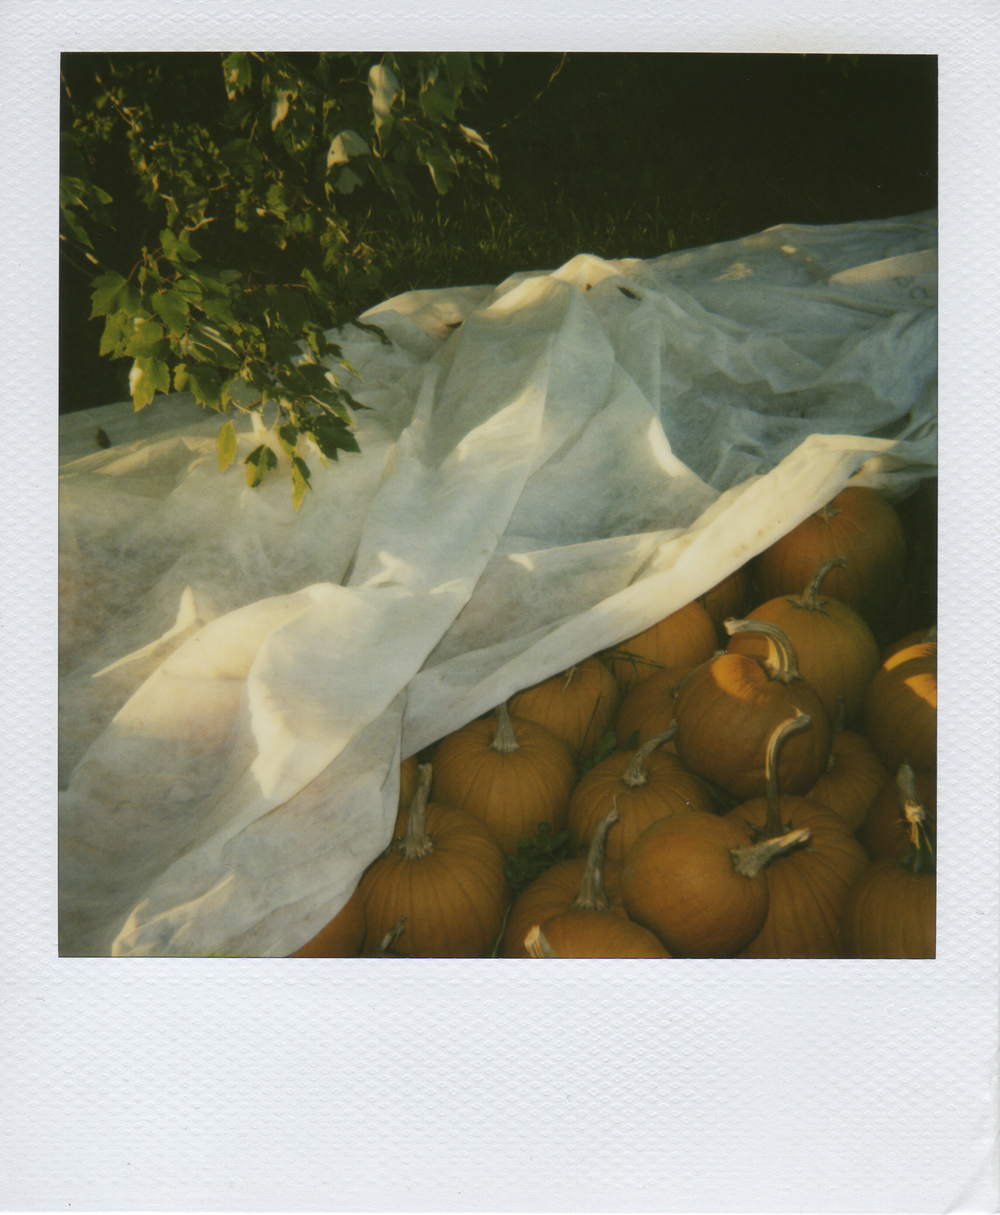 jlaurence-polaroid-060.jpg